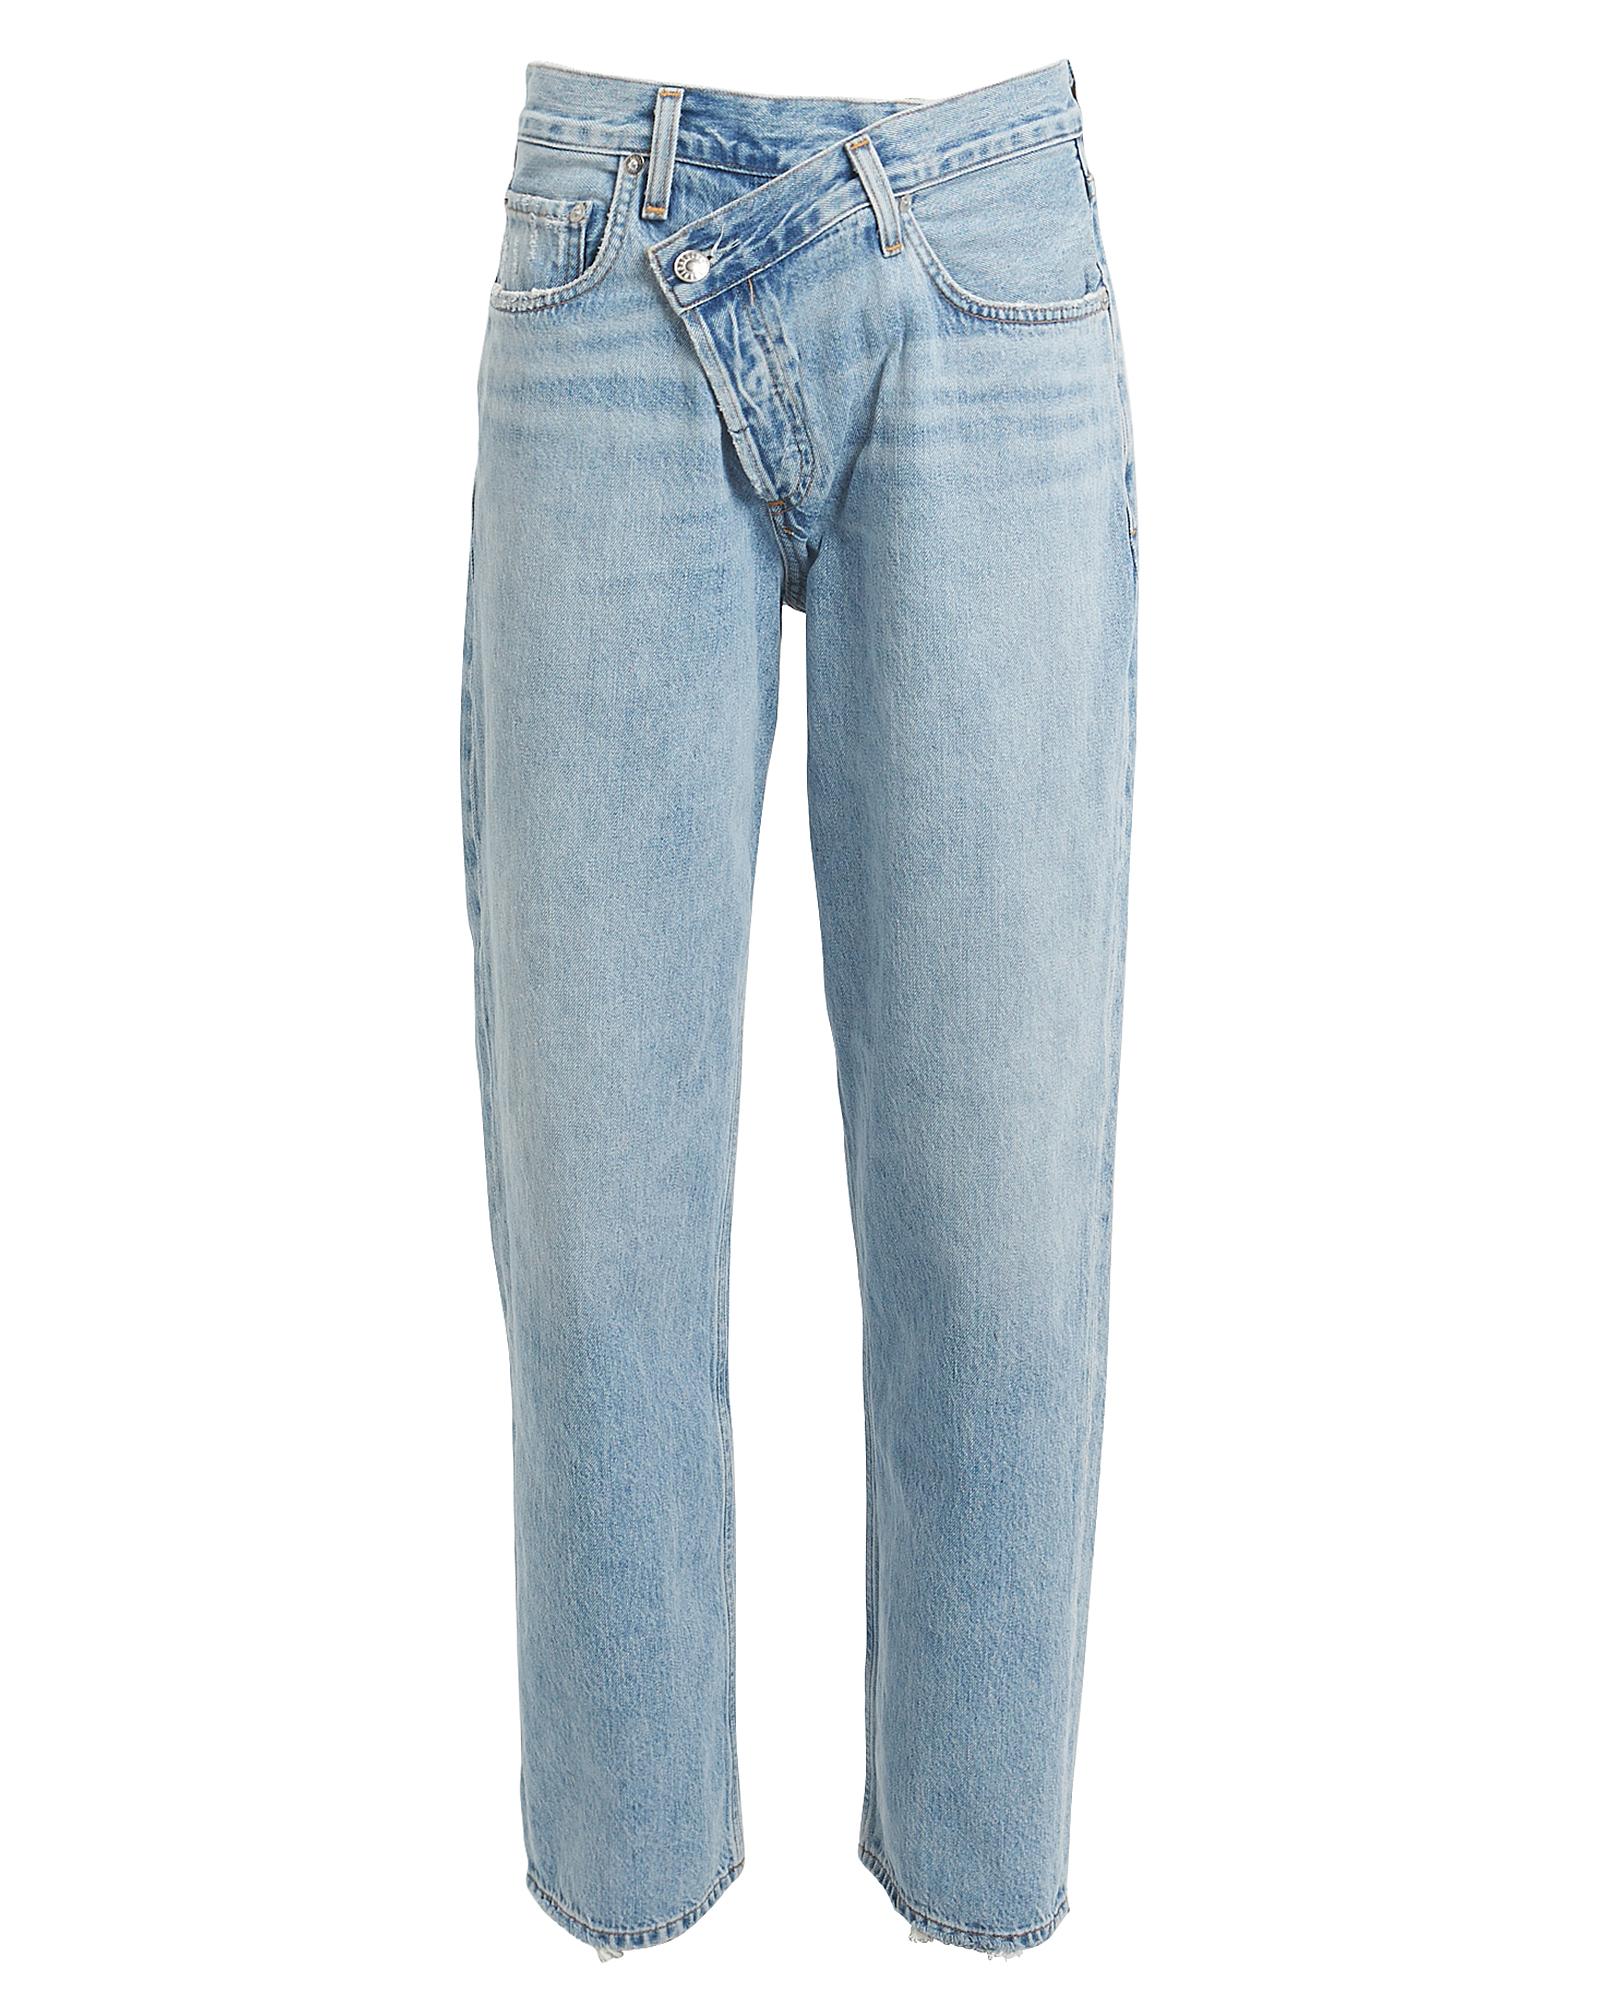 Criss Cross Upsized Jeans by Agolde